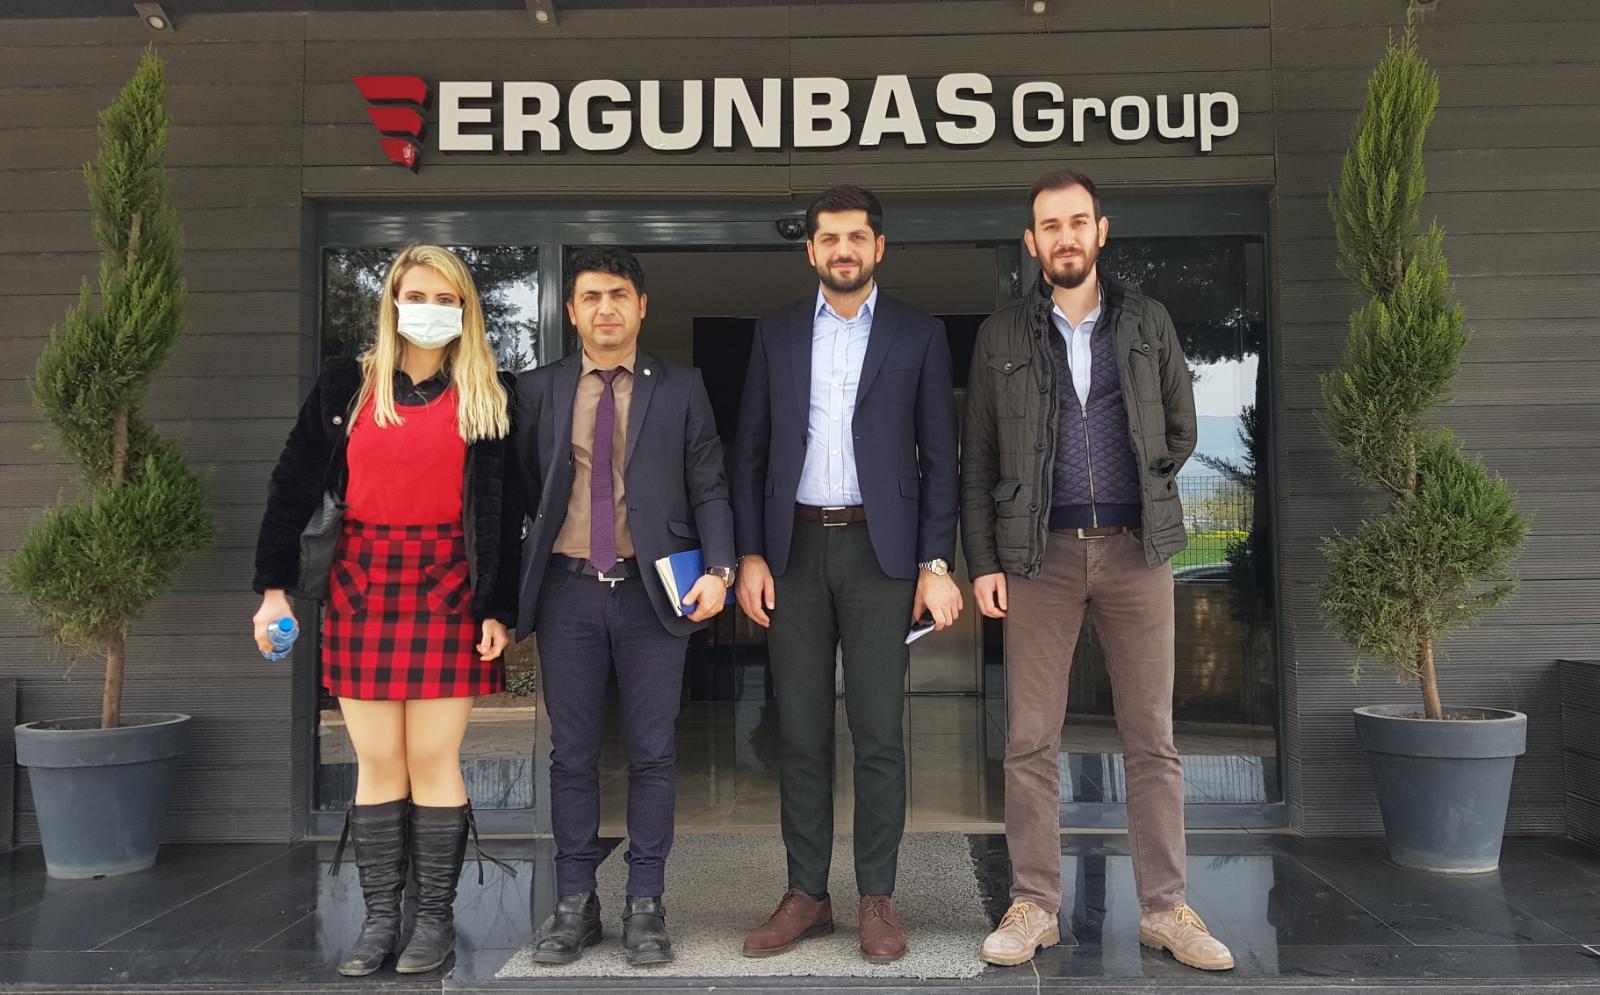 İSTE-TTO'dan ERGÜNBAŞ GROUP'a Ziyaret